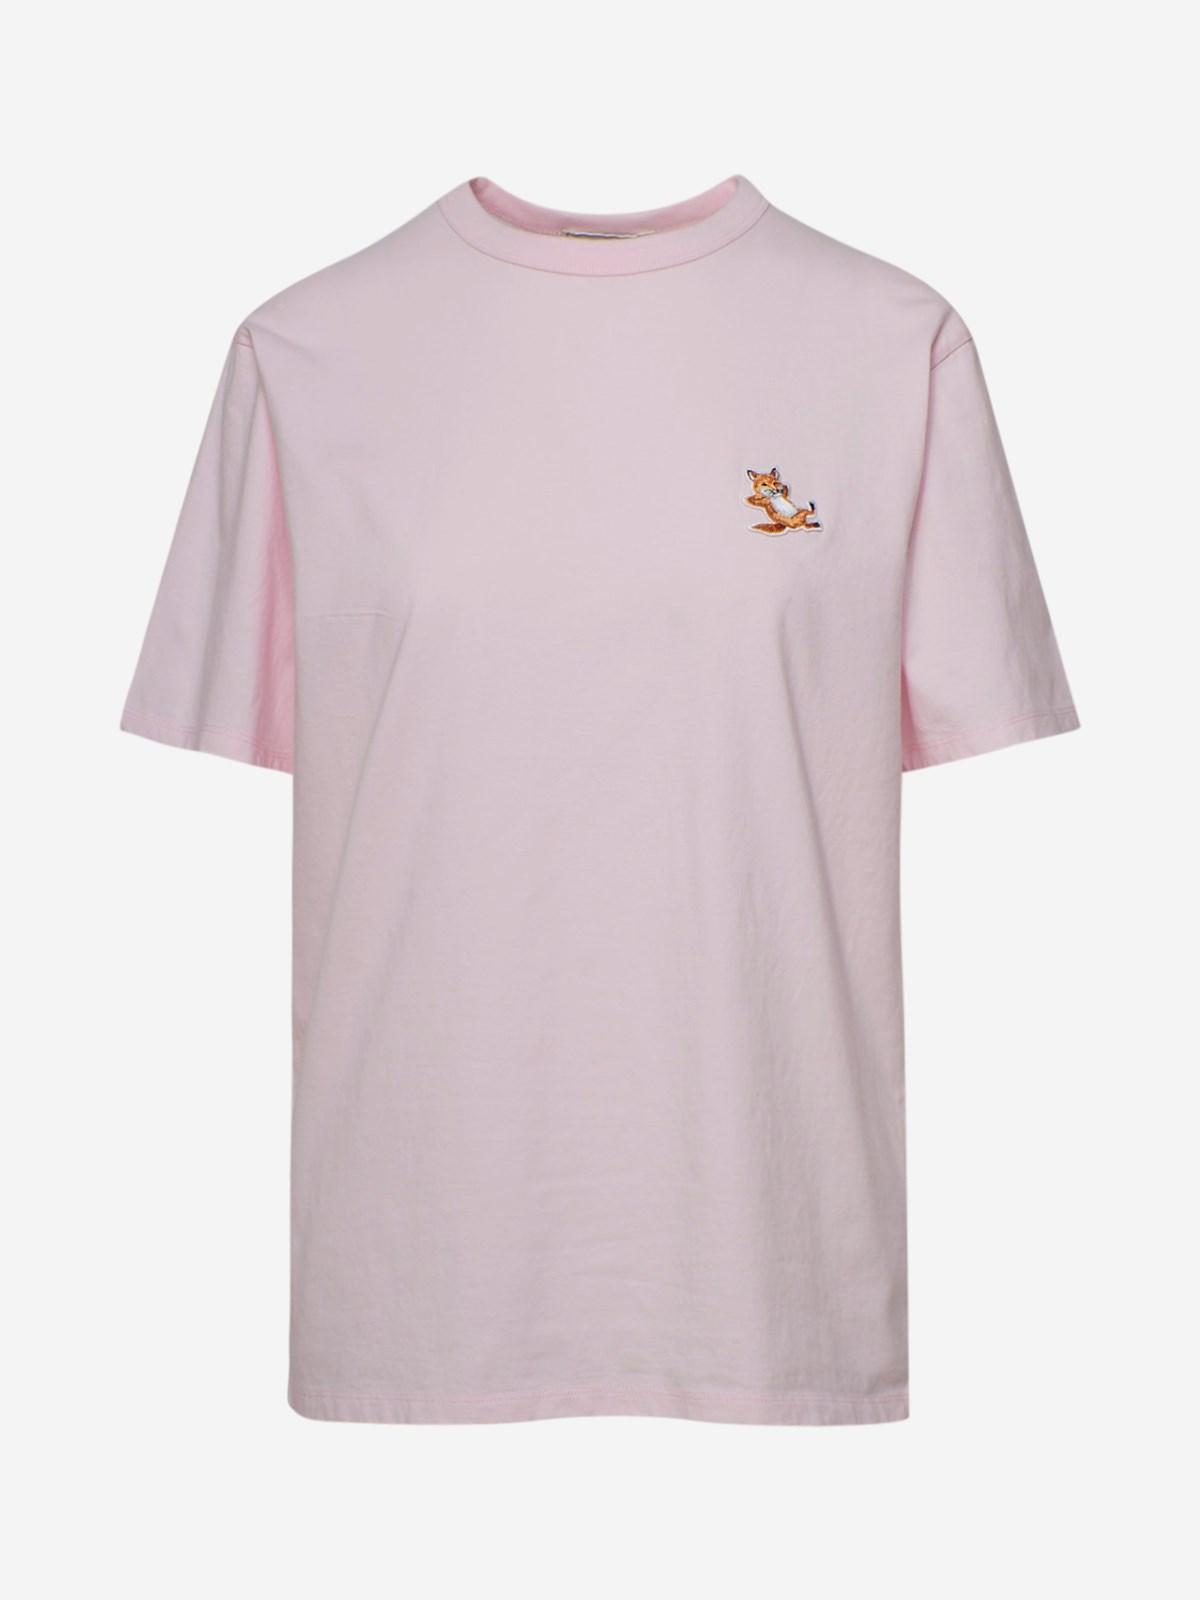 Maison Kitsuné T-shirts T-SHIRT CHILLAX FOX ROSA